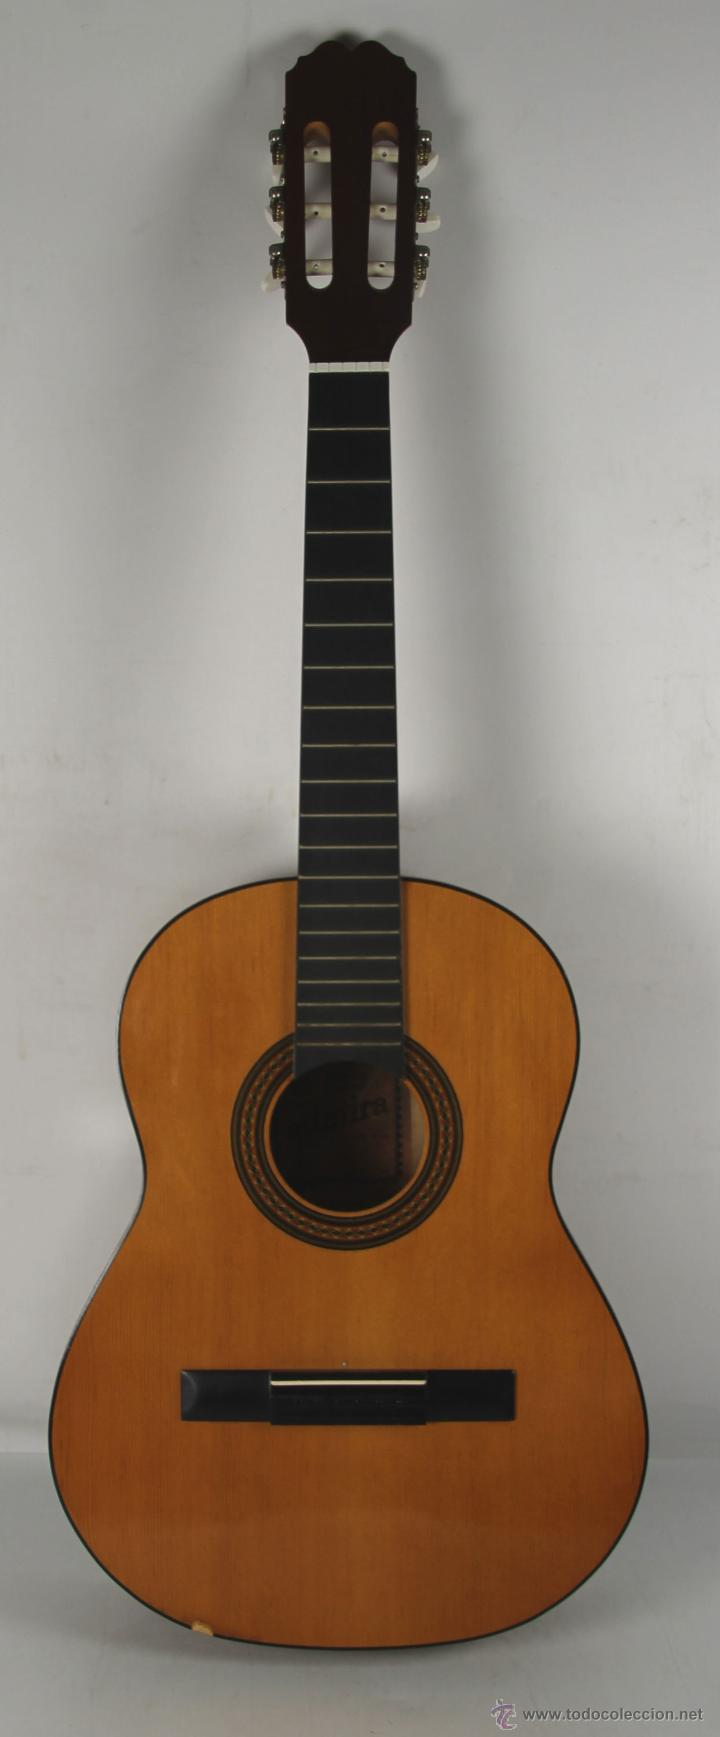 GUITARRA CLASICA. MARCA ADMIRA. MODELO ESTUDIO. AÑOS 70. (Música - Instrumentos Musicales - Guitarras Antiguas)